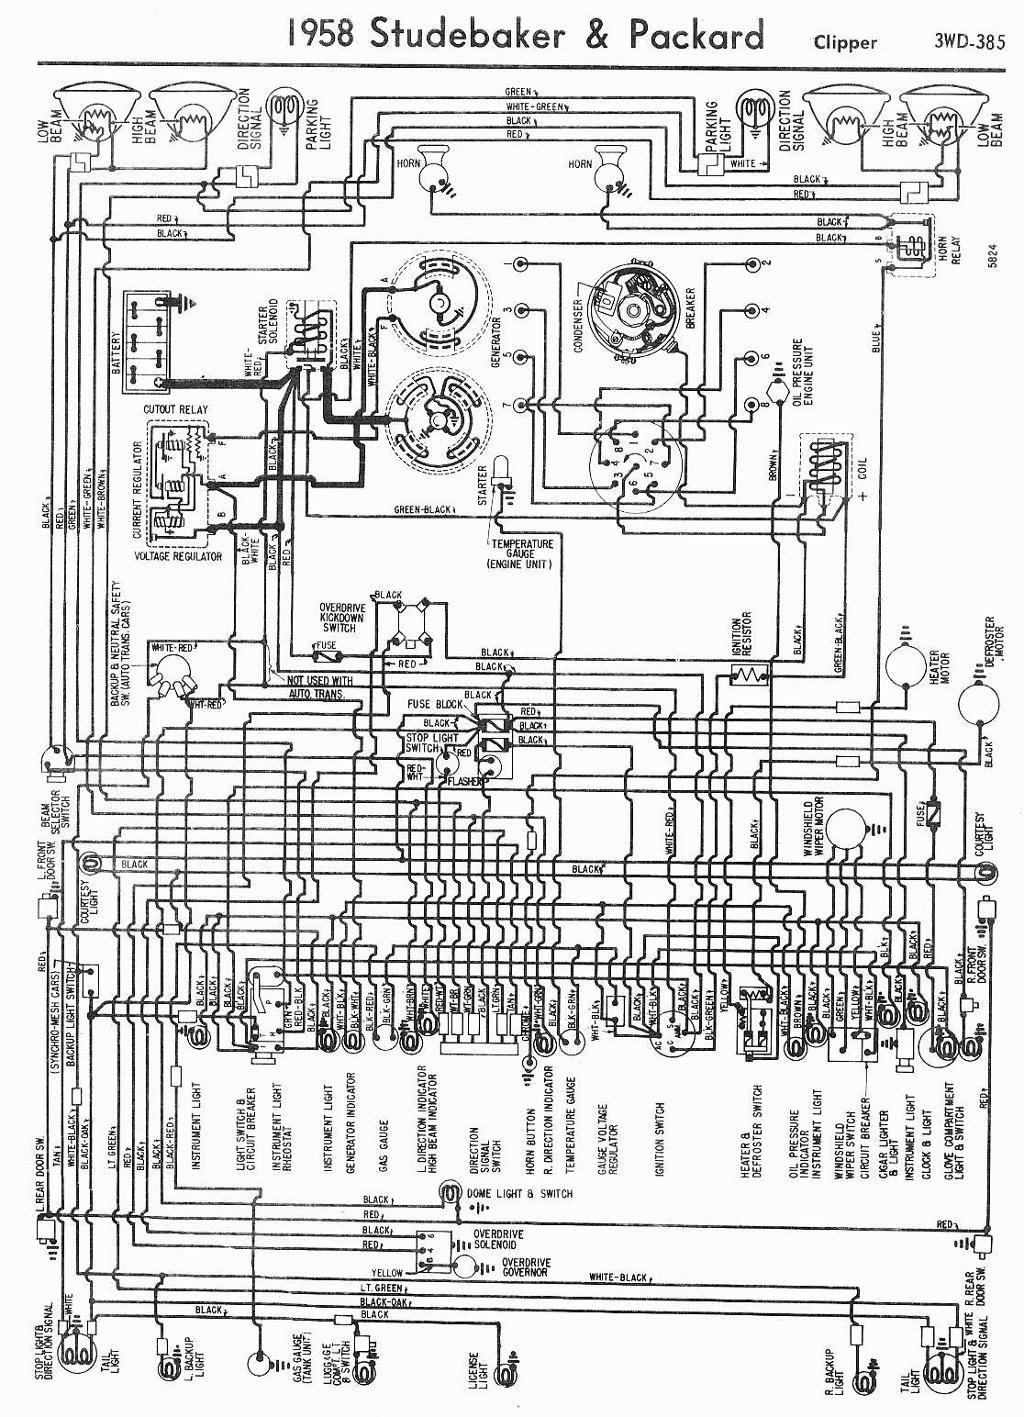 76 fiat wiring diagram electrical wiring diagrams starter 1980 fiat 124 76 fiat wiring diagram [ 1024 x 1417 Pixel ]